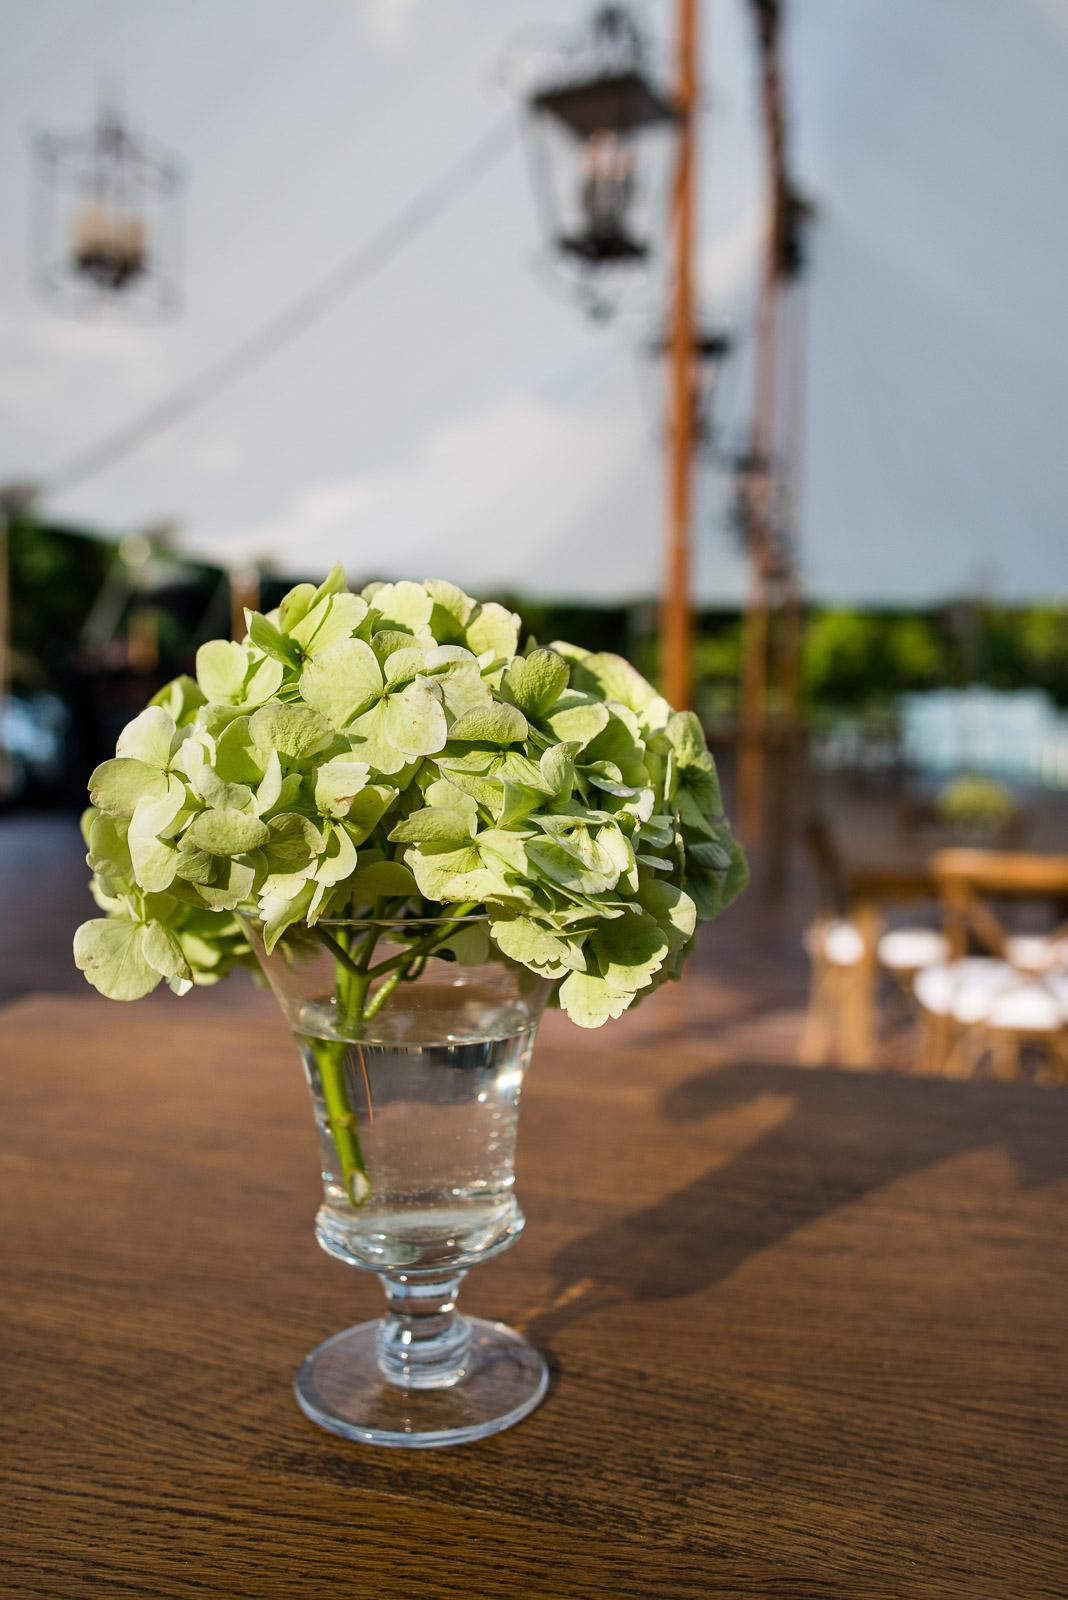 birch-bespoke-events-and-weddings.jpg